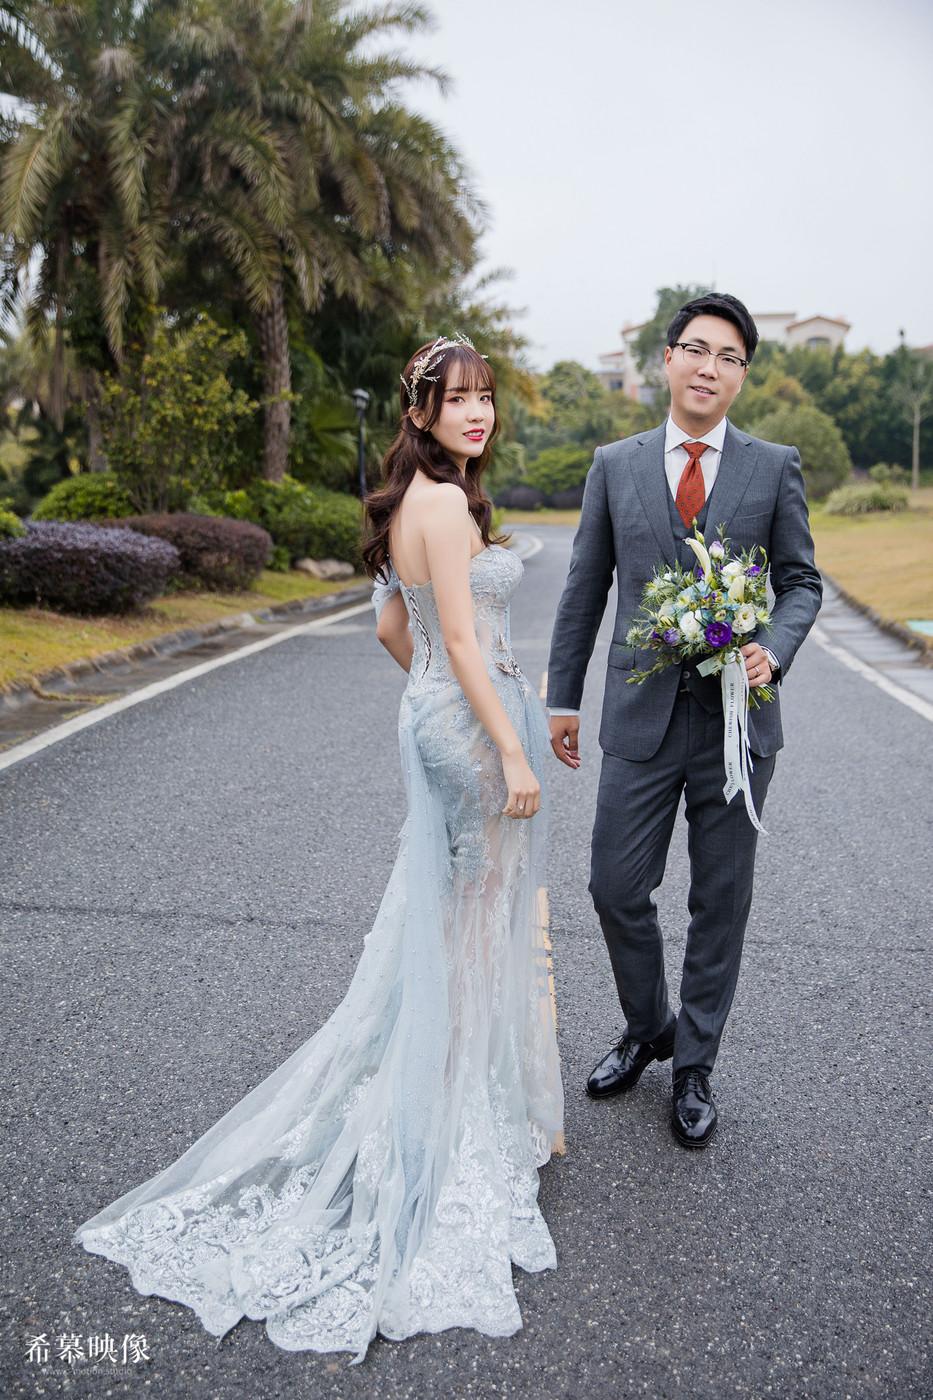 Pitt&Lcr's Wedding day26